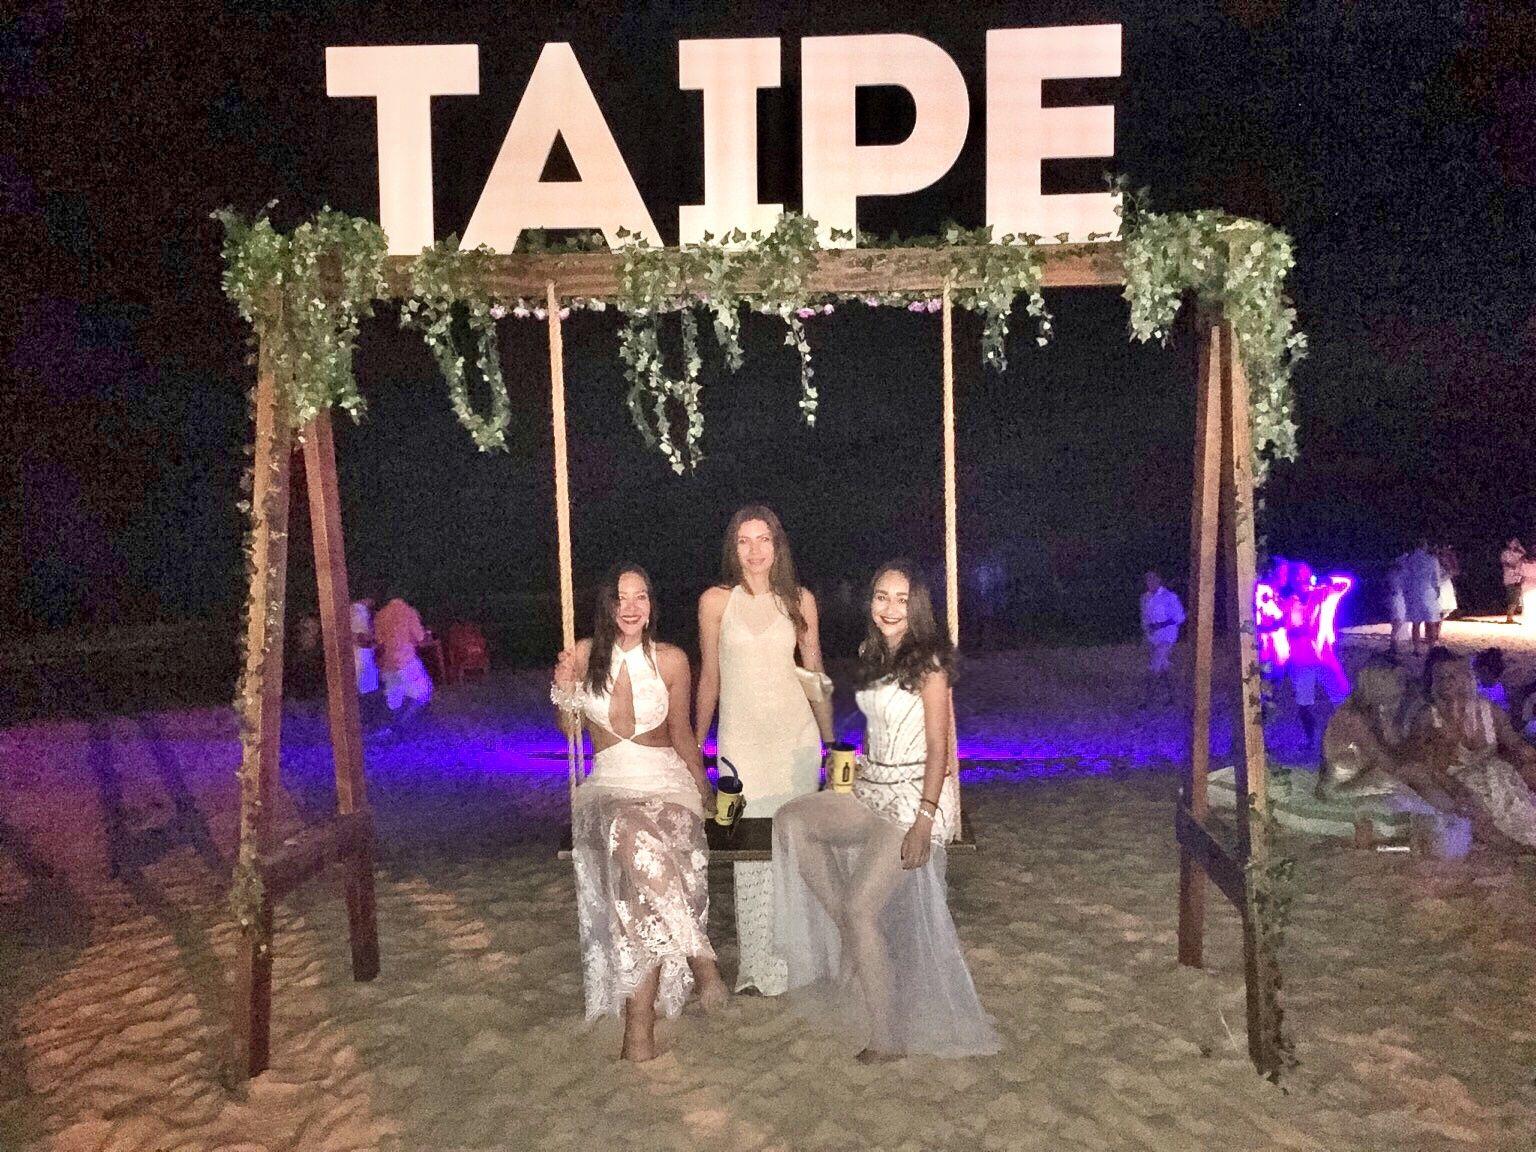 Réveillon Taipe - Trancoso   WE ARE BAHIA2   Pinterest